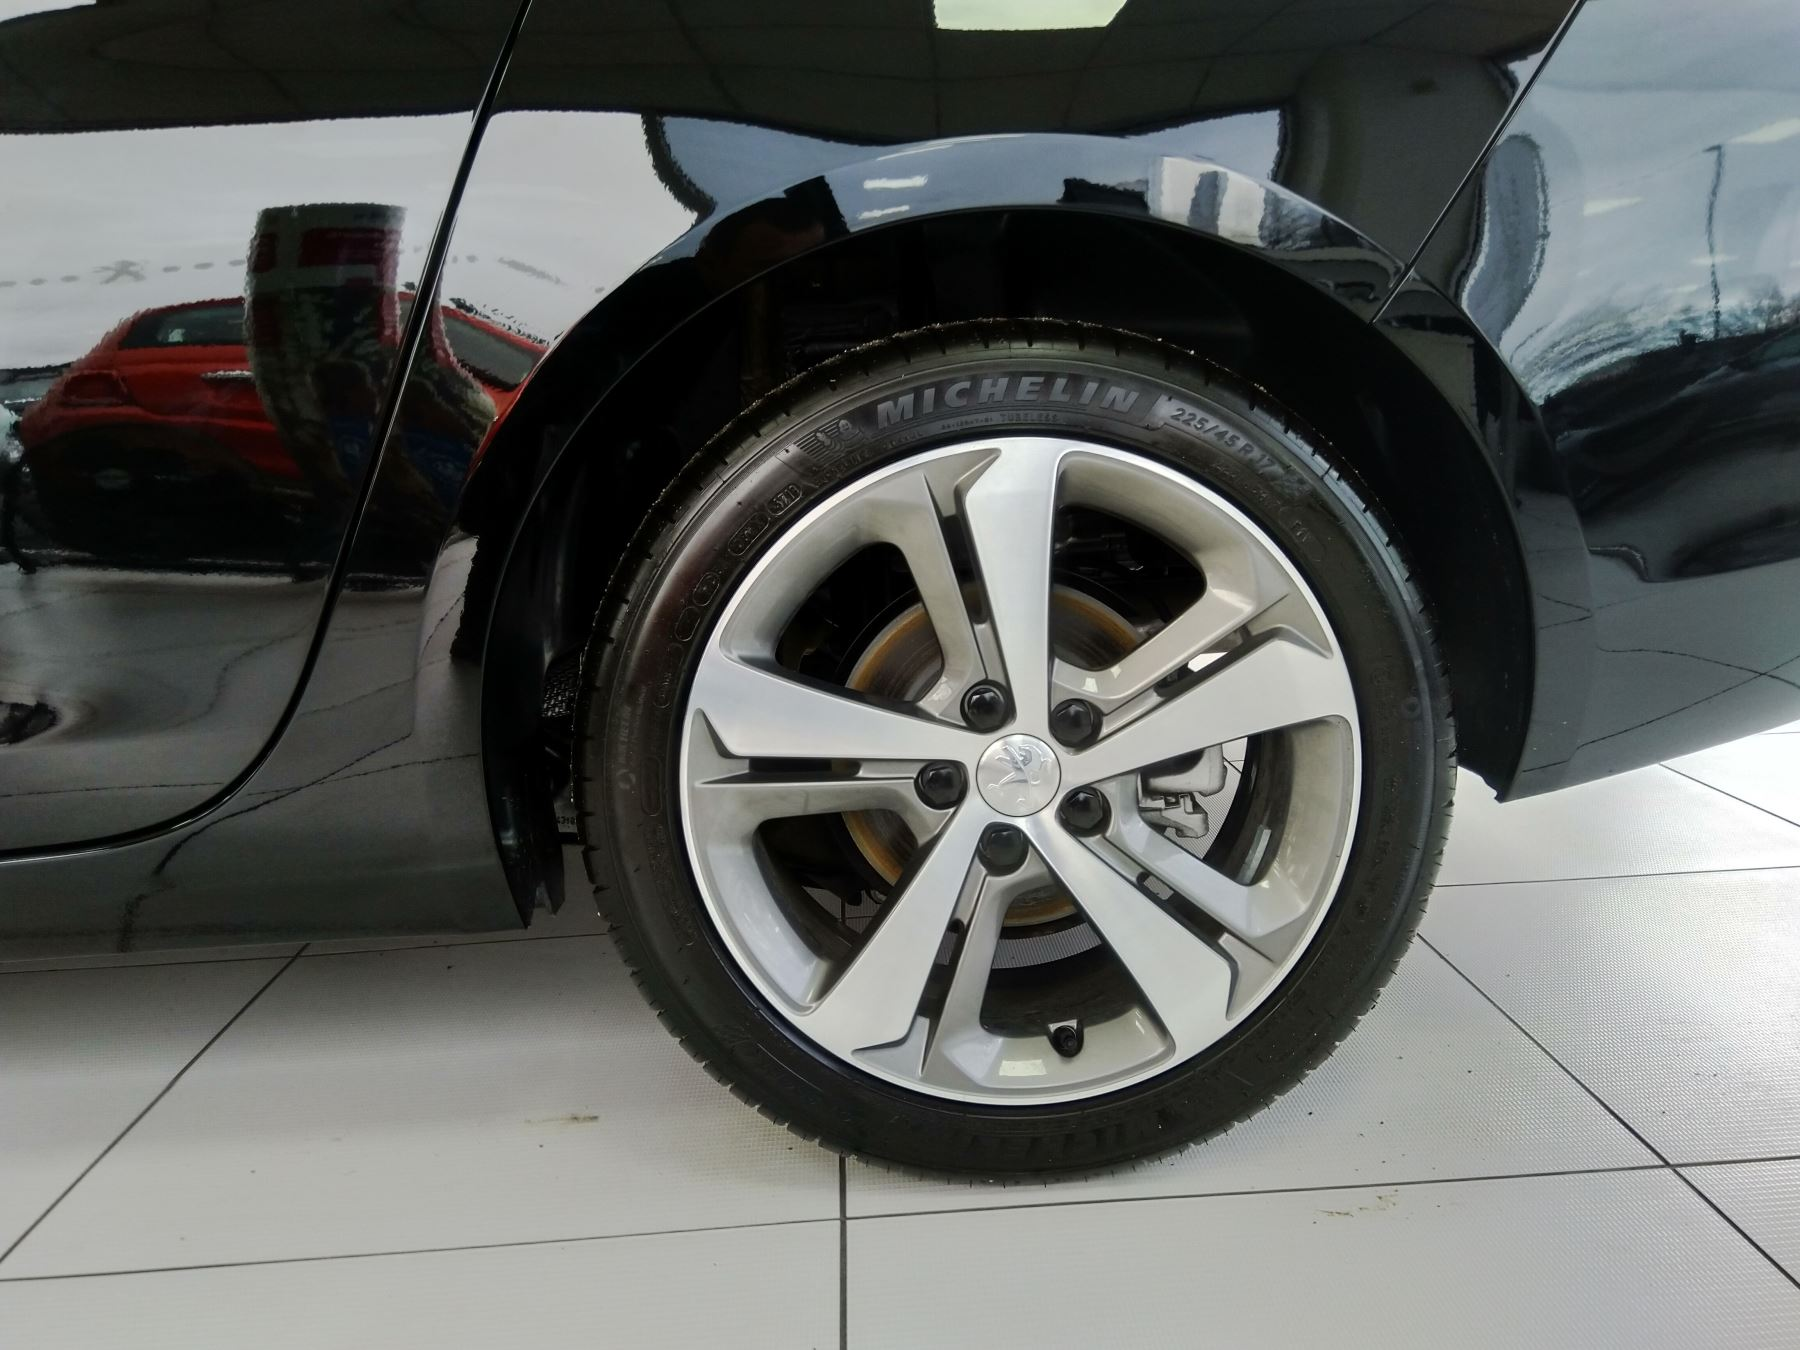 Peugeot 308 1.5 BlueHDi 130 Tech Edition image 9